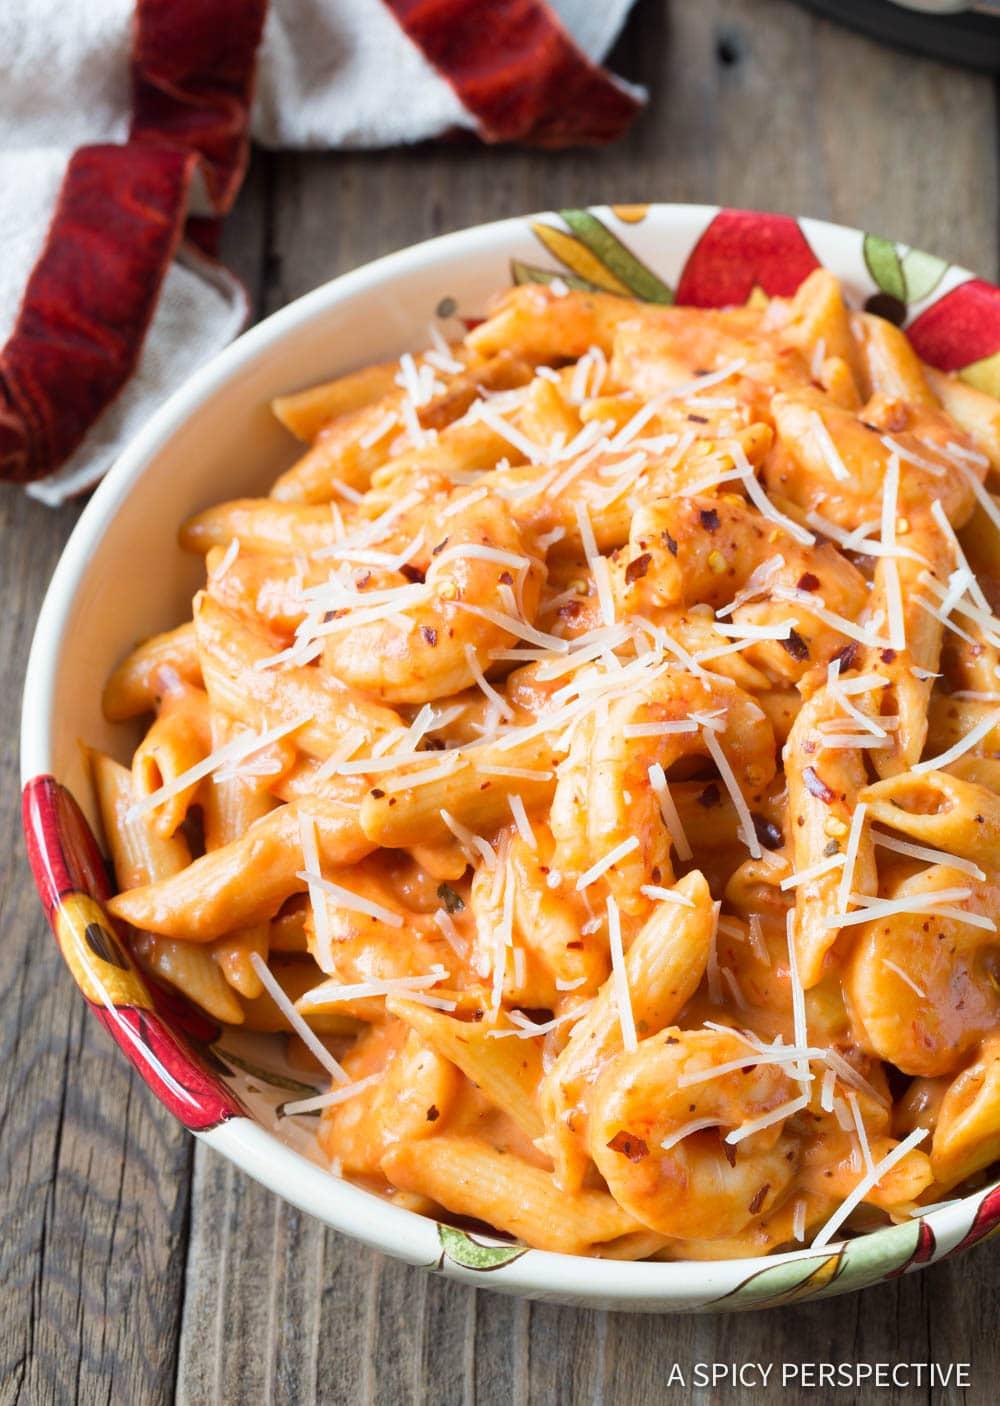 Best Instant Pot Shrimp Pasta with Vodka Sauce Recipe #ASpicyPerspective